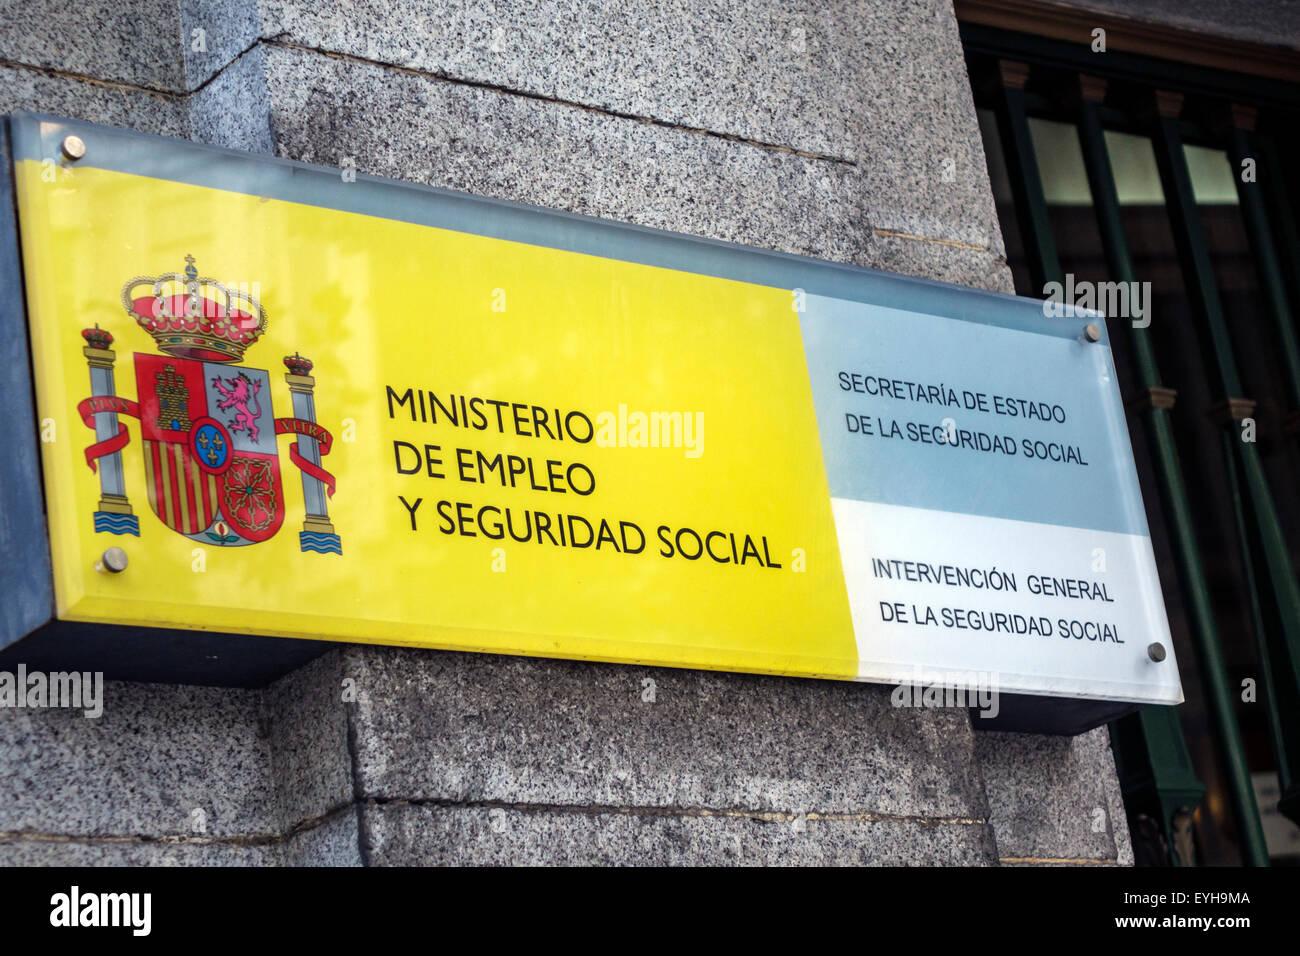 Madrid spain europe spanish ministerio de empleo y for Ministerio de seguridad espana